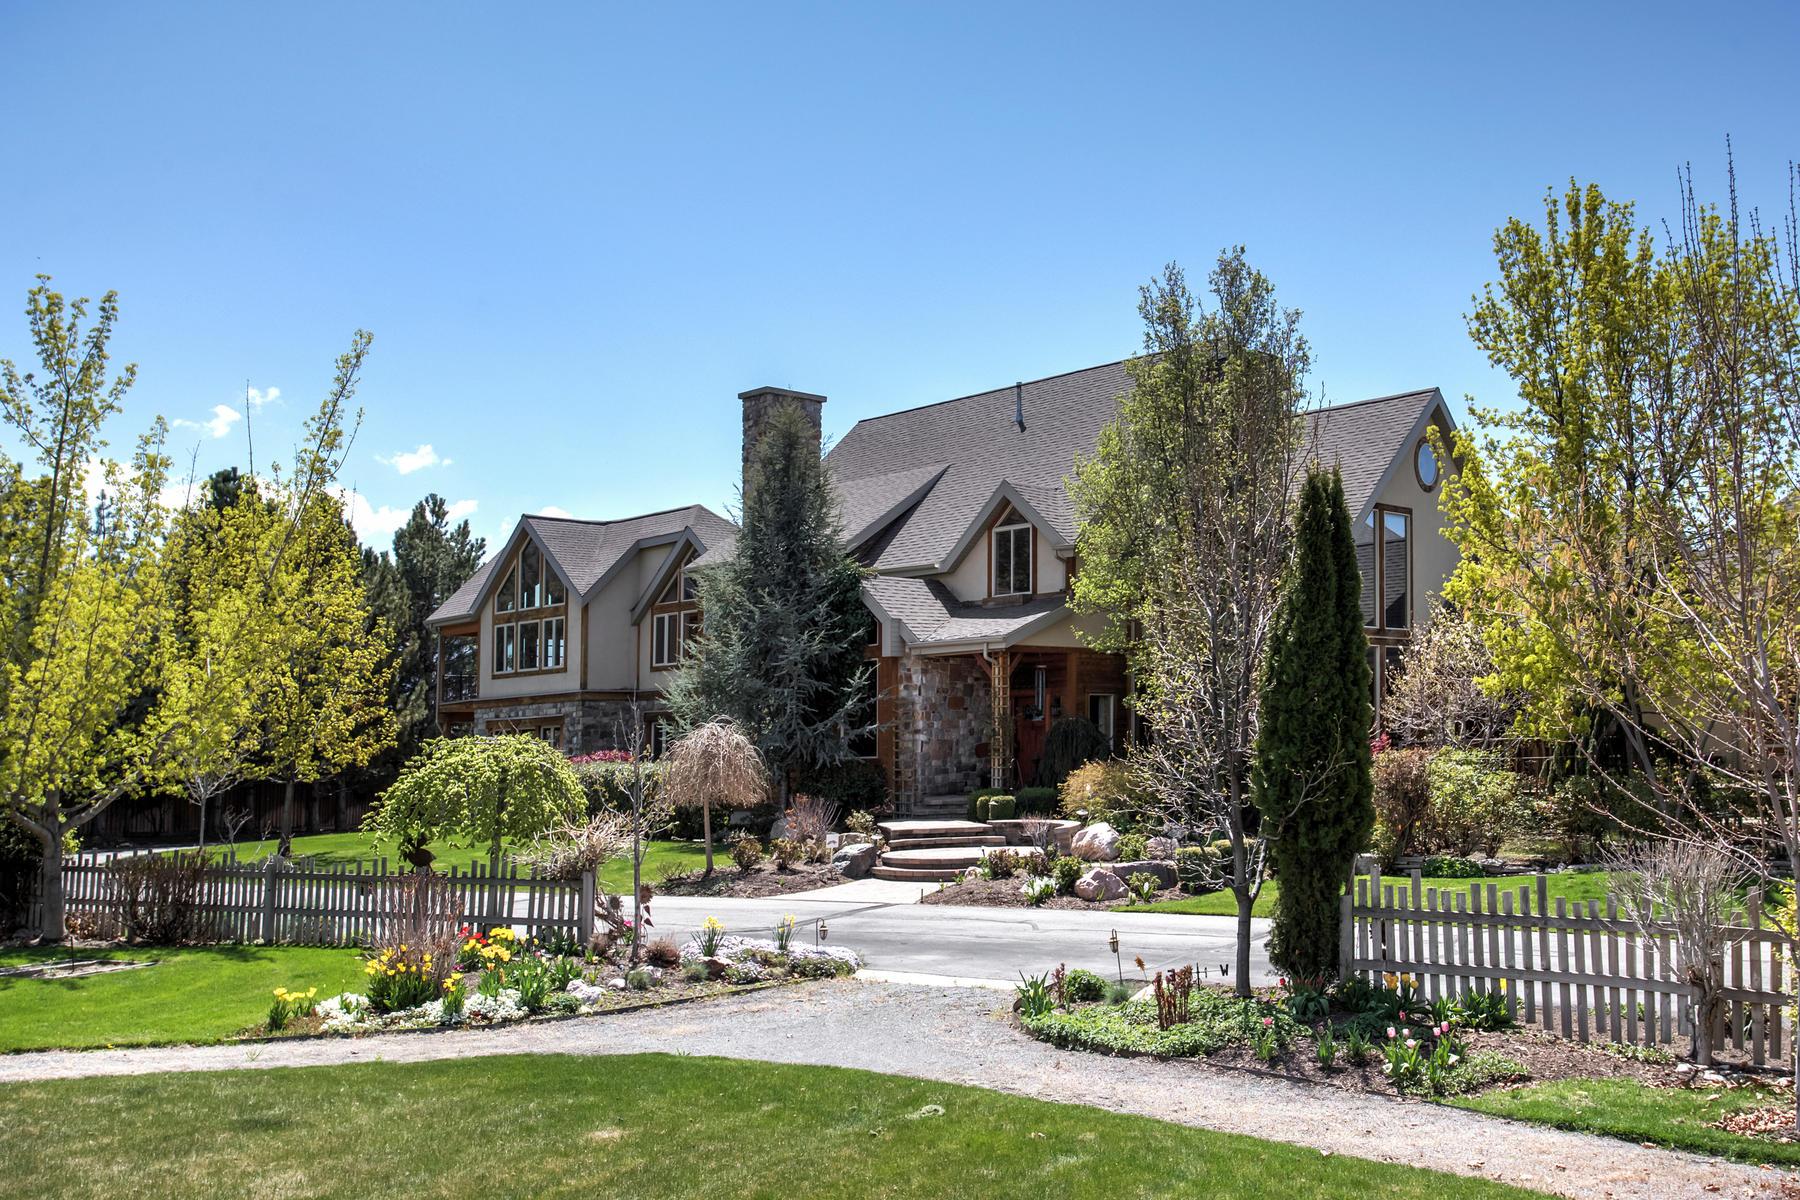 Single Family Homes için Satış at Private Estate in Northeast Orem 304 East 1600 North, Orem, Utah 84057 Amerika Birleşik Devletleri